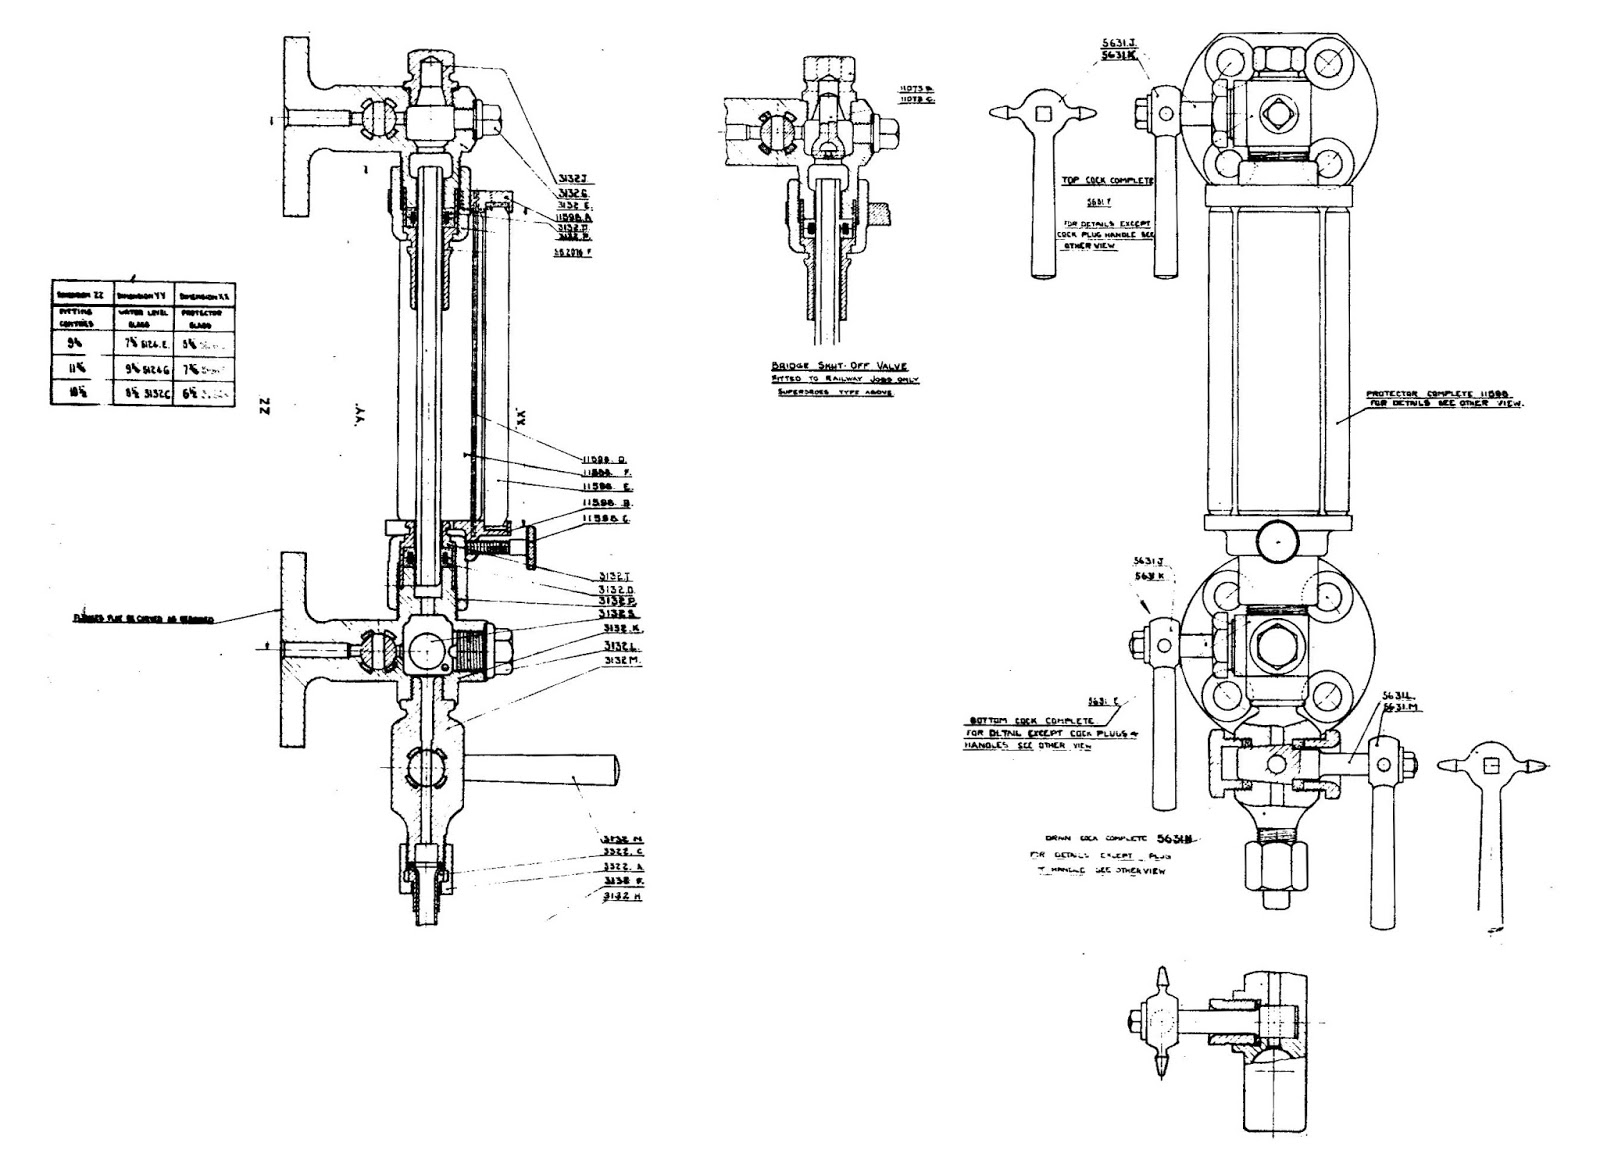 gauge glass valve arrangement similar to 7109 s [ 1600 x 1164 Pixel ]